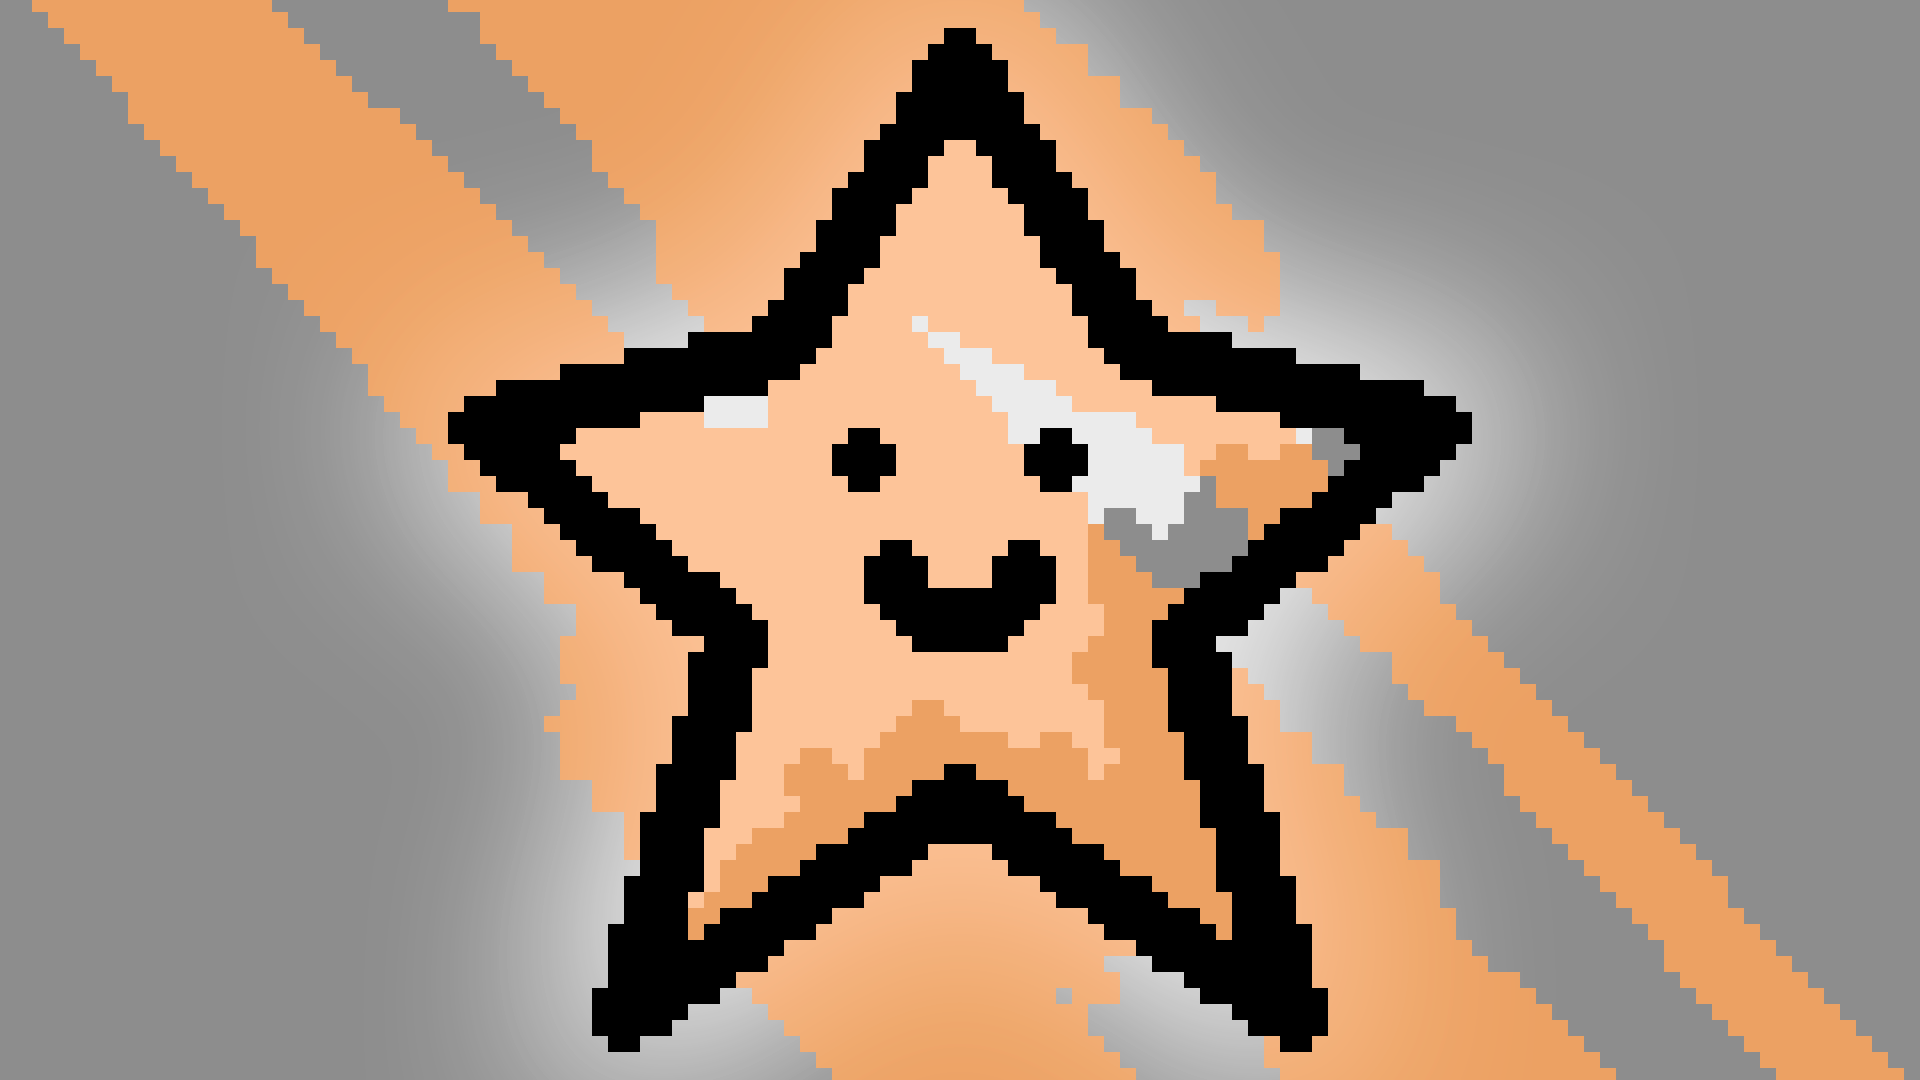 Icon for Beige world 50%